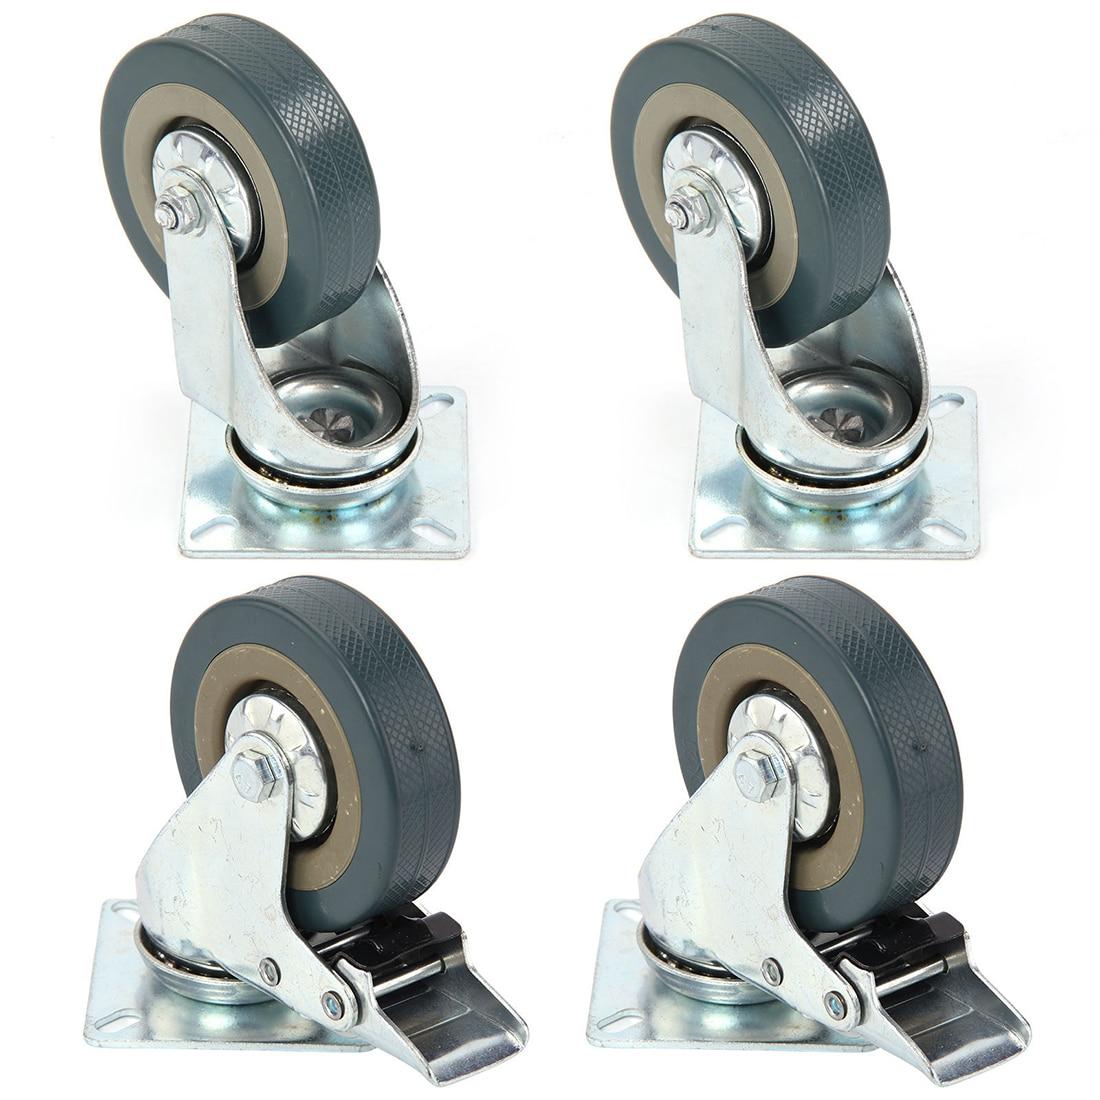 Set Of Heavy Duty 2.5/3/4/5 Inch Rubber Swivel Castor Wheels Trolley Caster Brake 2 With Brake + 2 Without Brake Universal Wheel